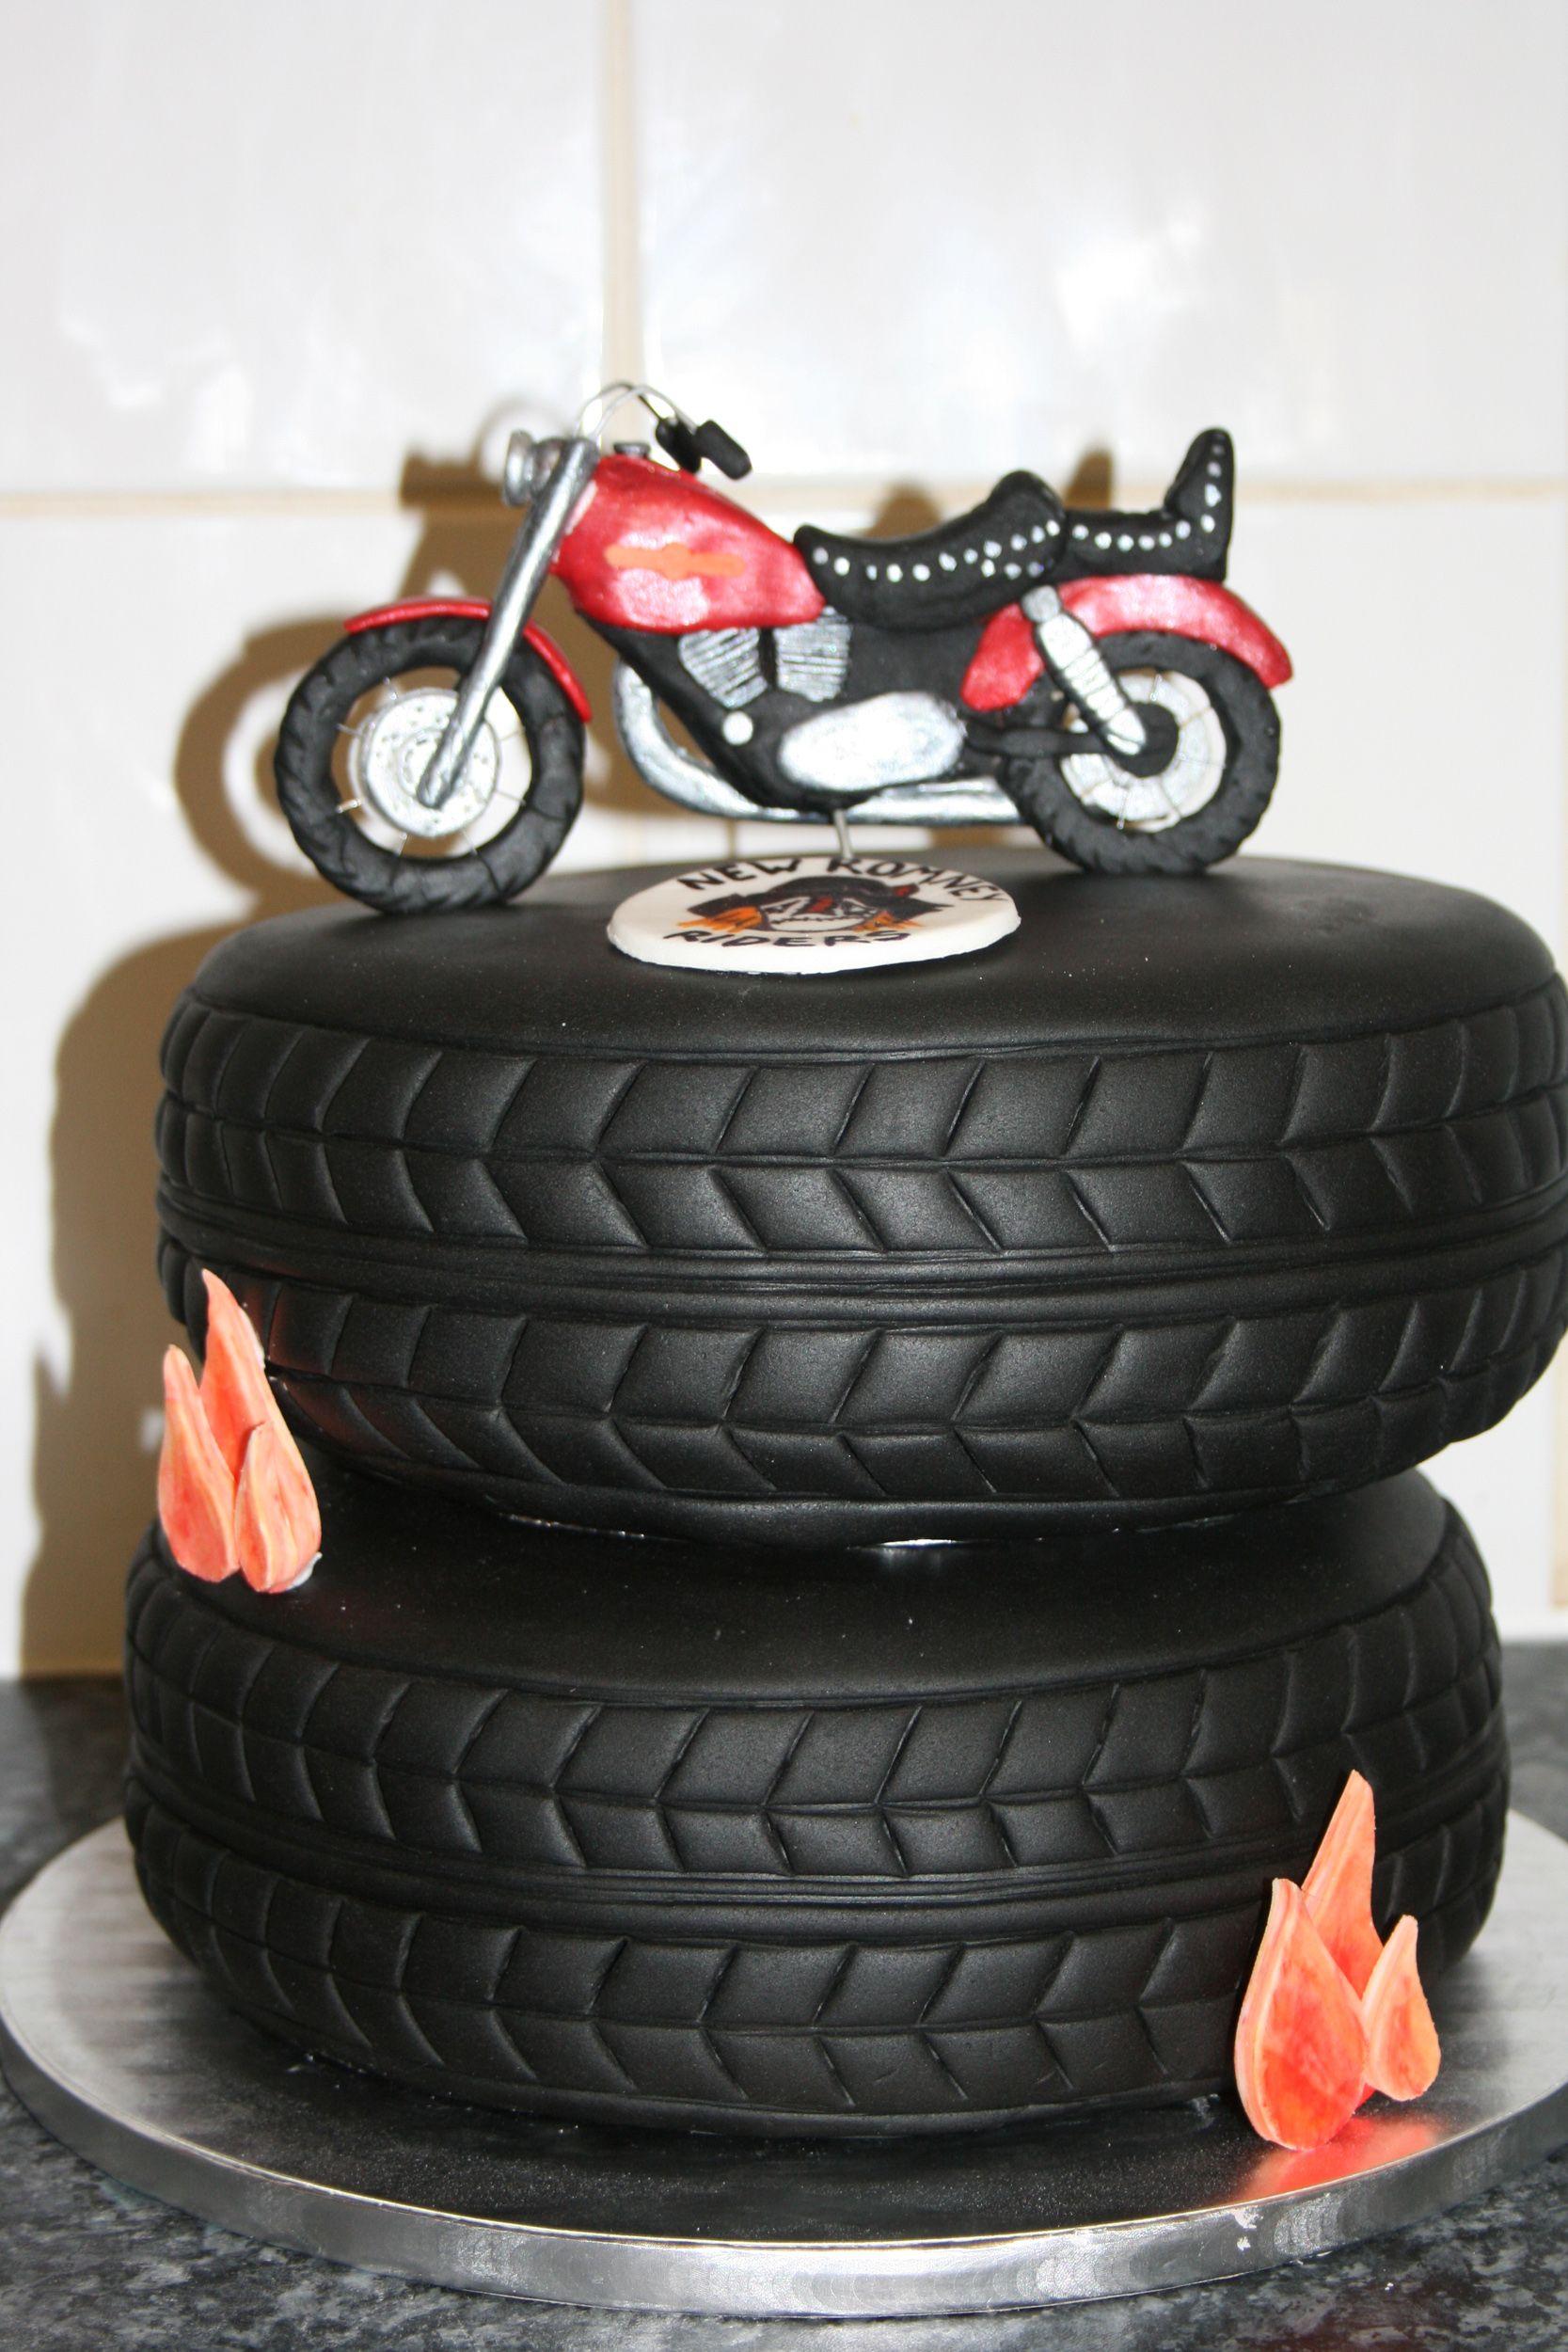 Swell Harley Davidson Cake Motorcycle Birthday Cakes Motorbike Cake Funny Birthday Cards Online Alyptdamsfinfo